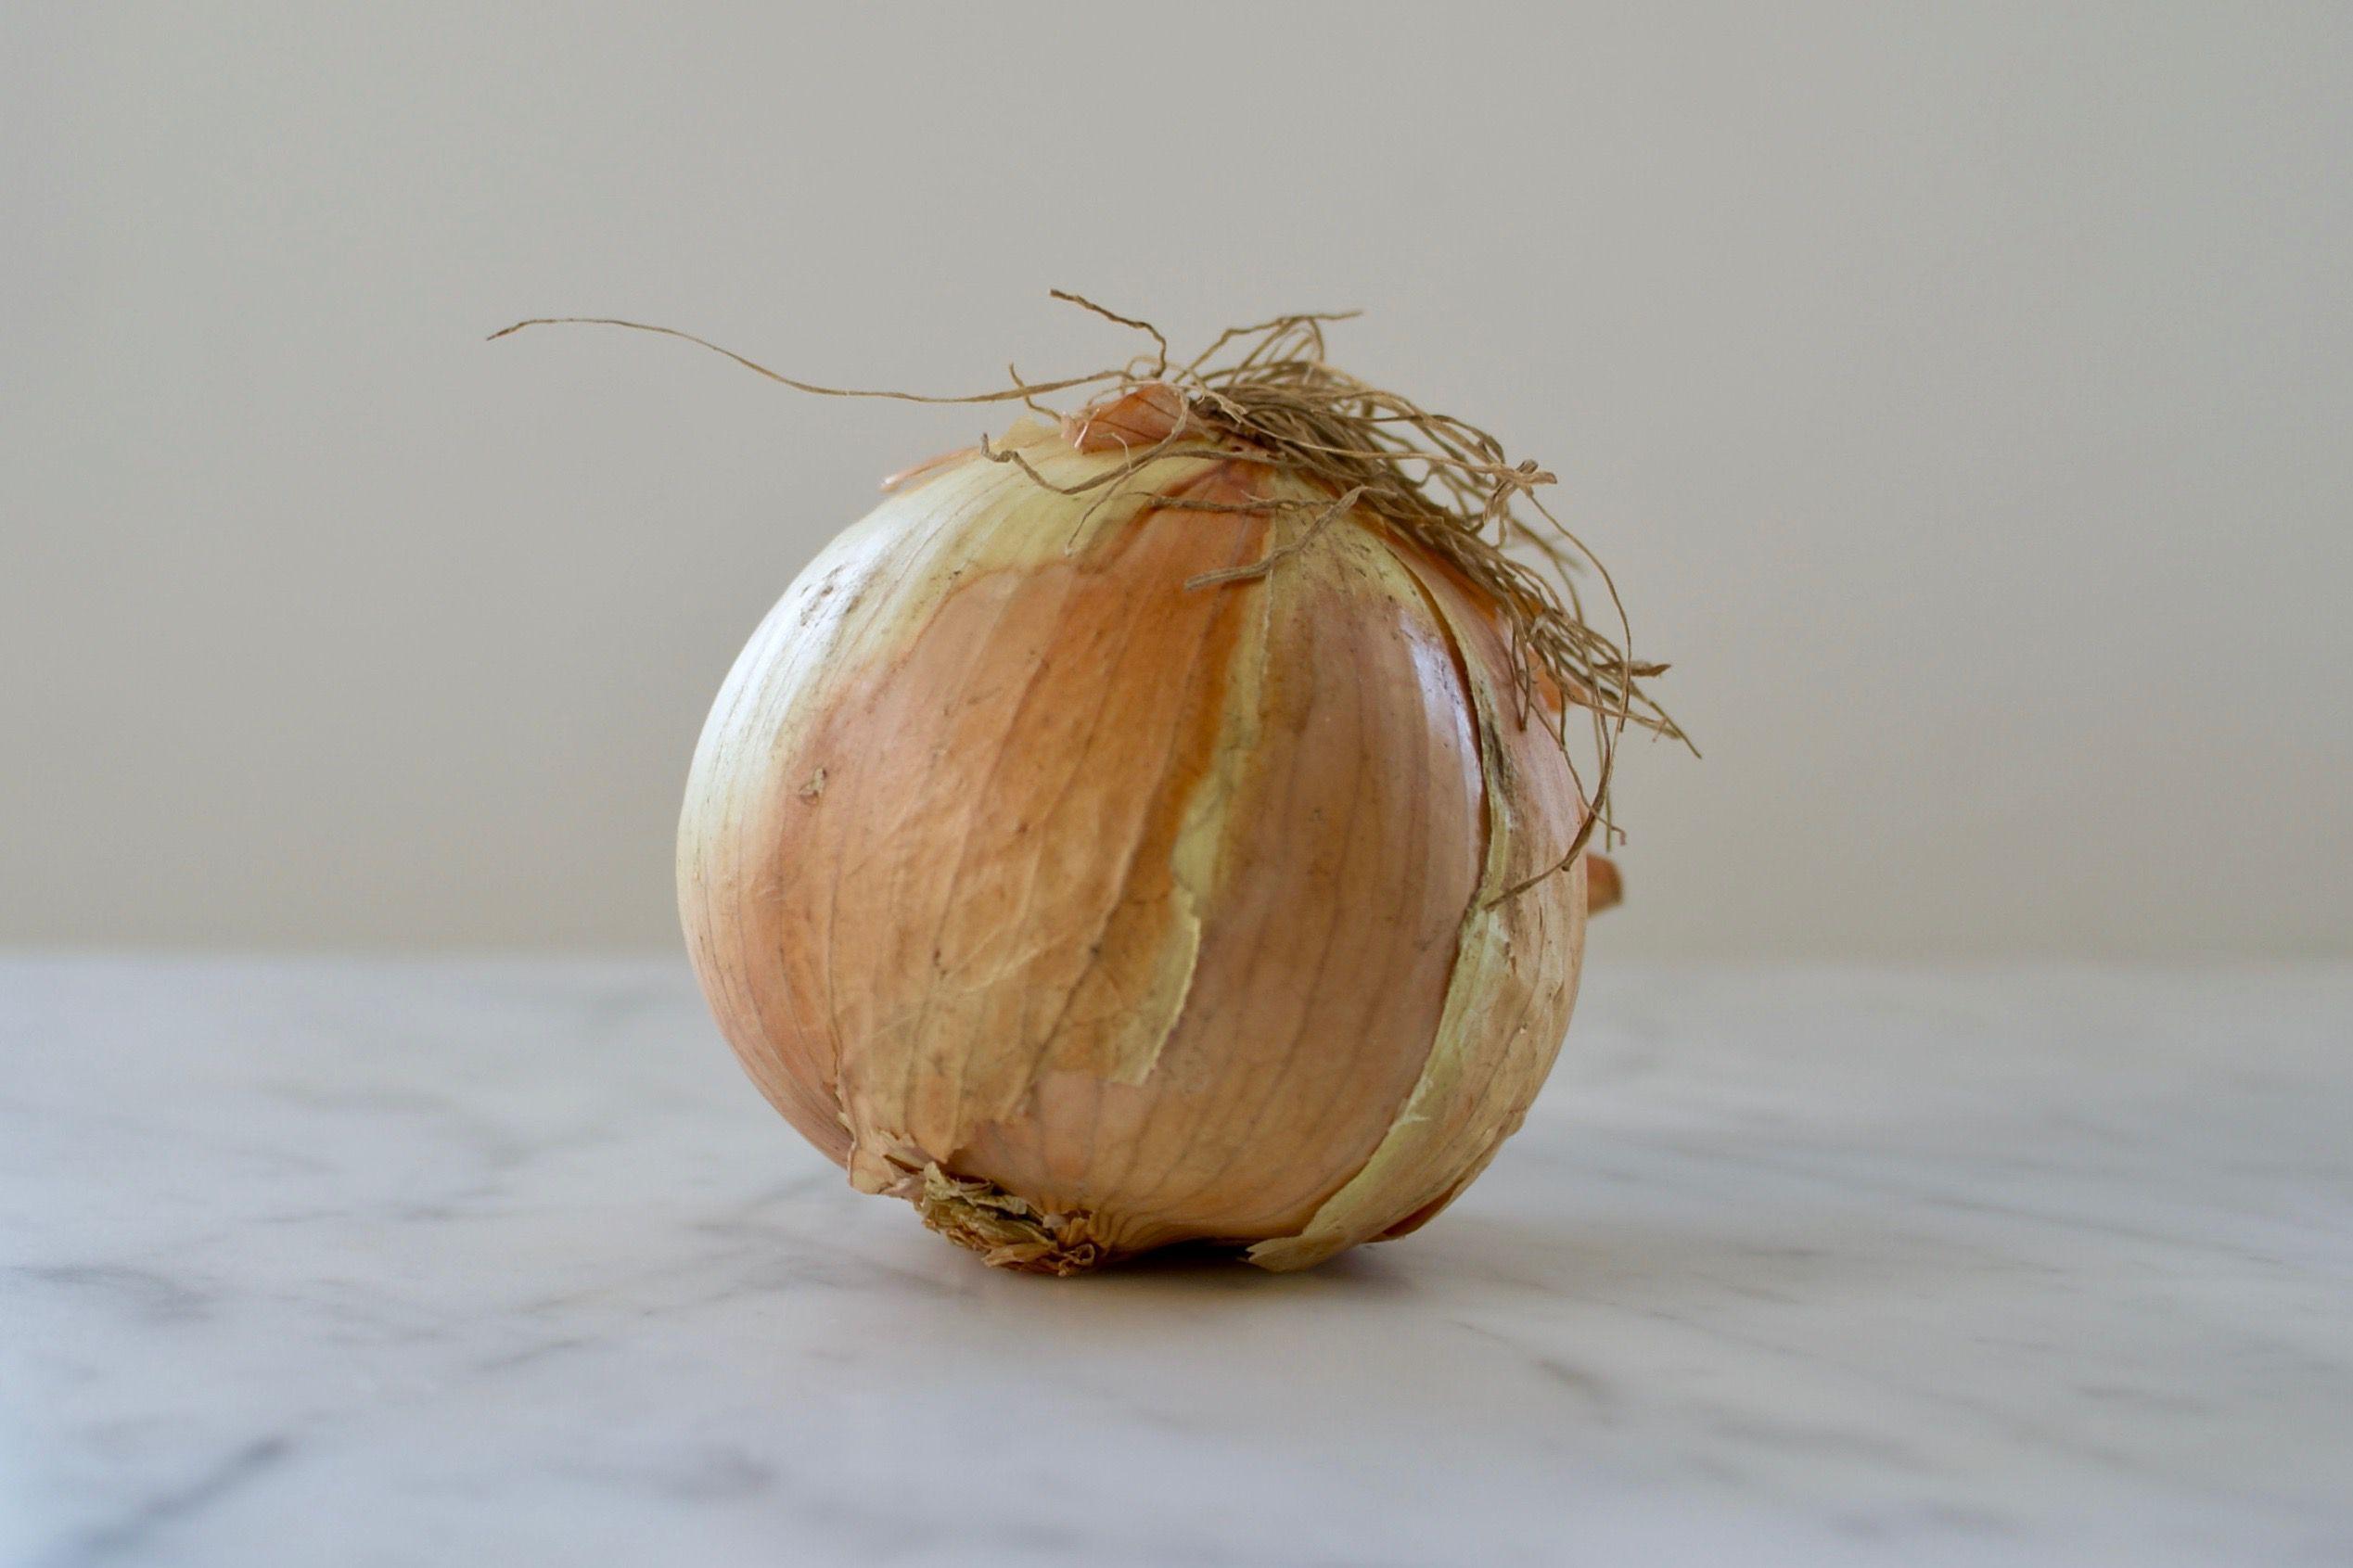 Interior designs medium size vertically growing onions growing onions - Interior Designs Medium Size Vertically Growing Onions Growing Onions 31